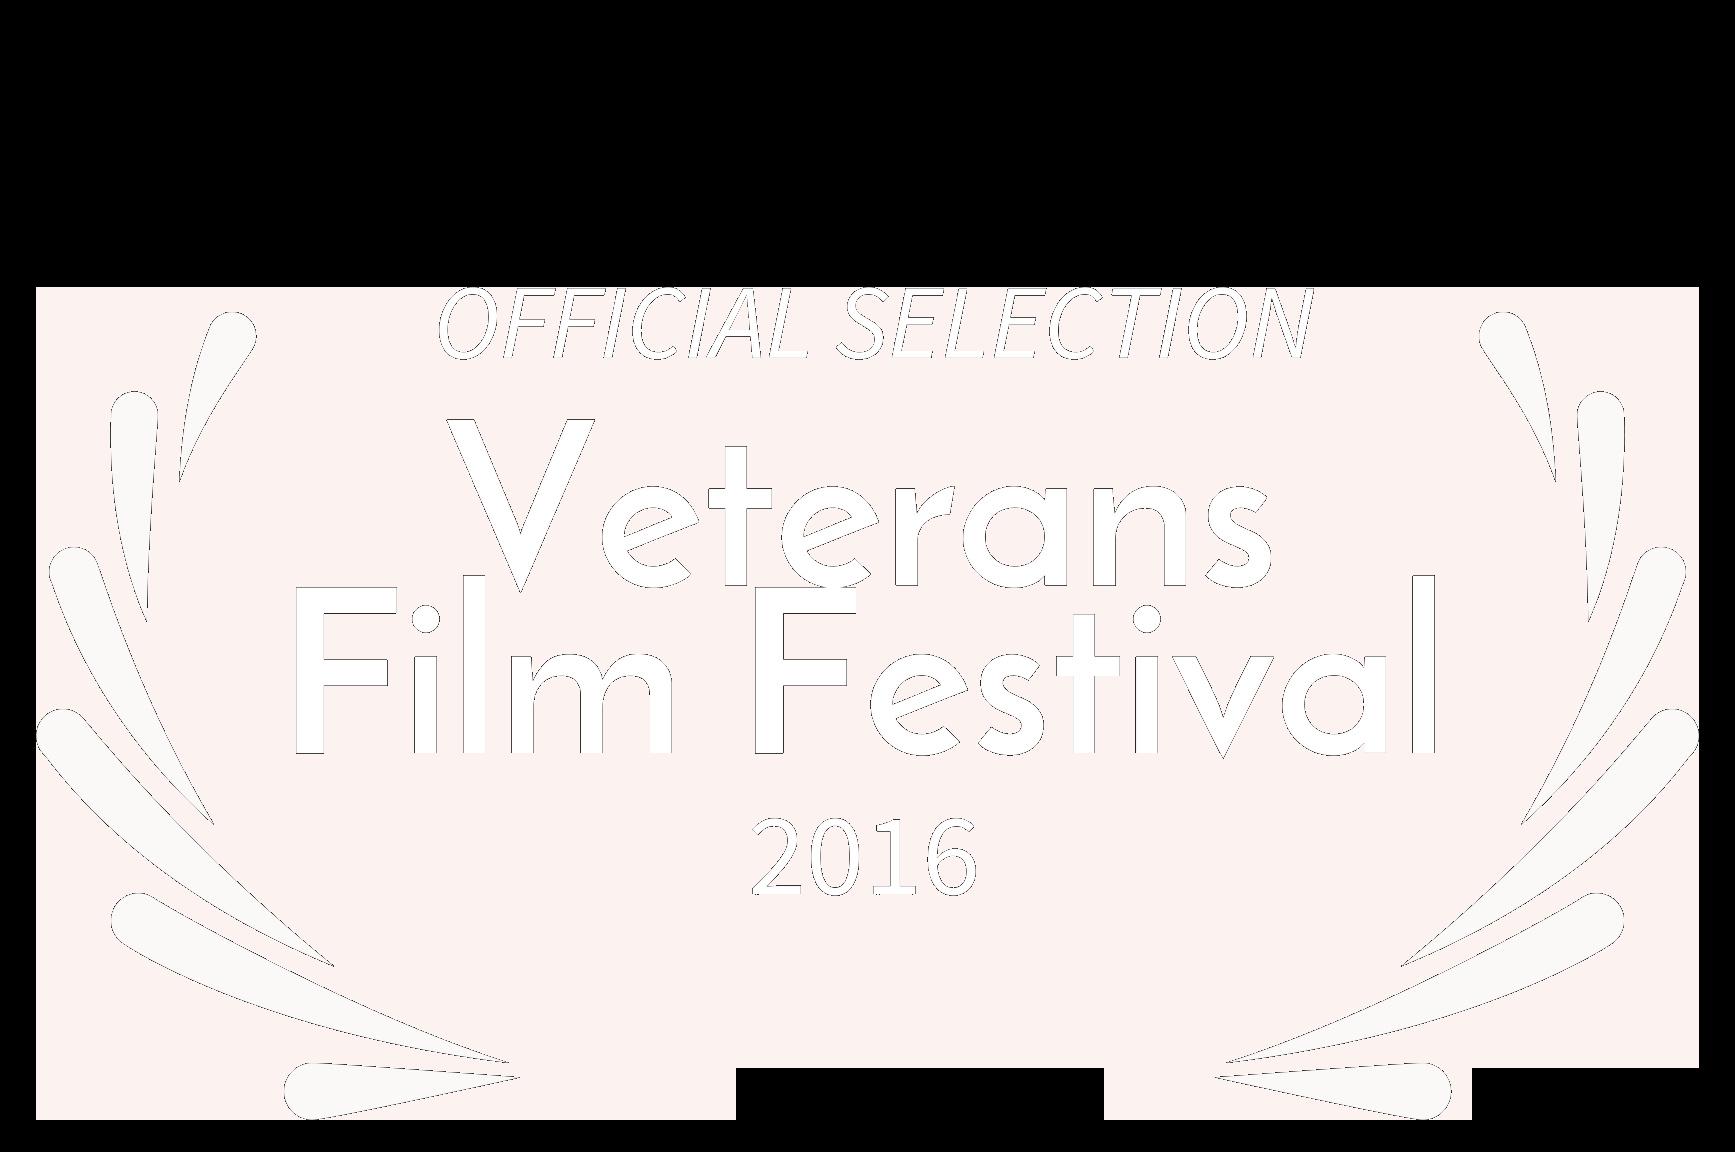 OFFICIAL SELECTION - Veterans Film Festival - 2016 neg transp.png